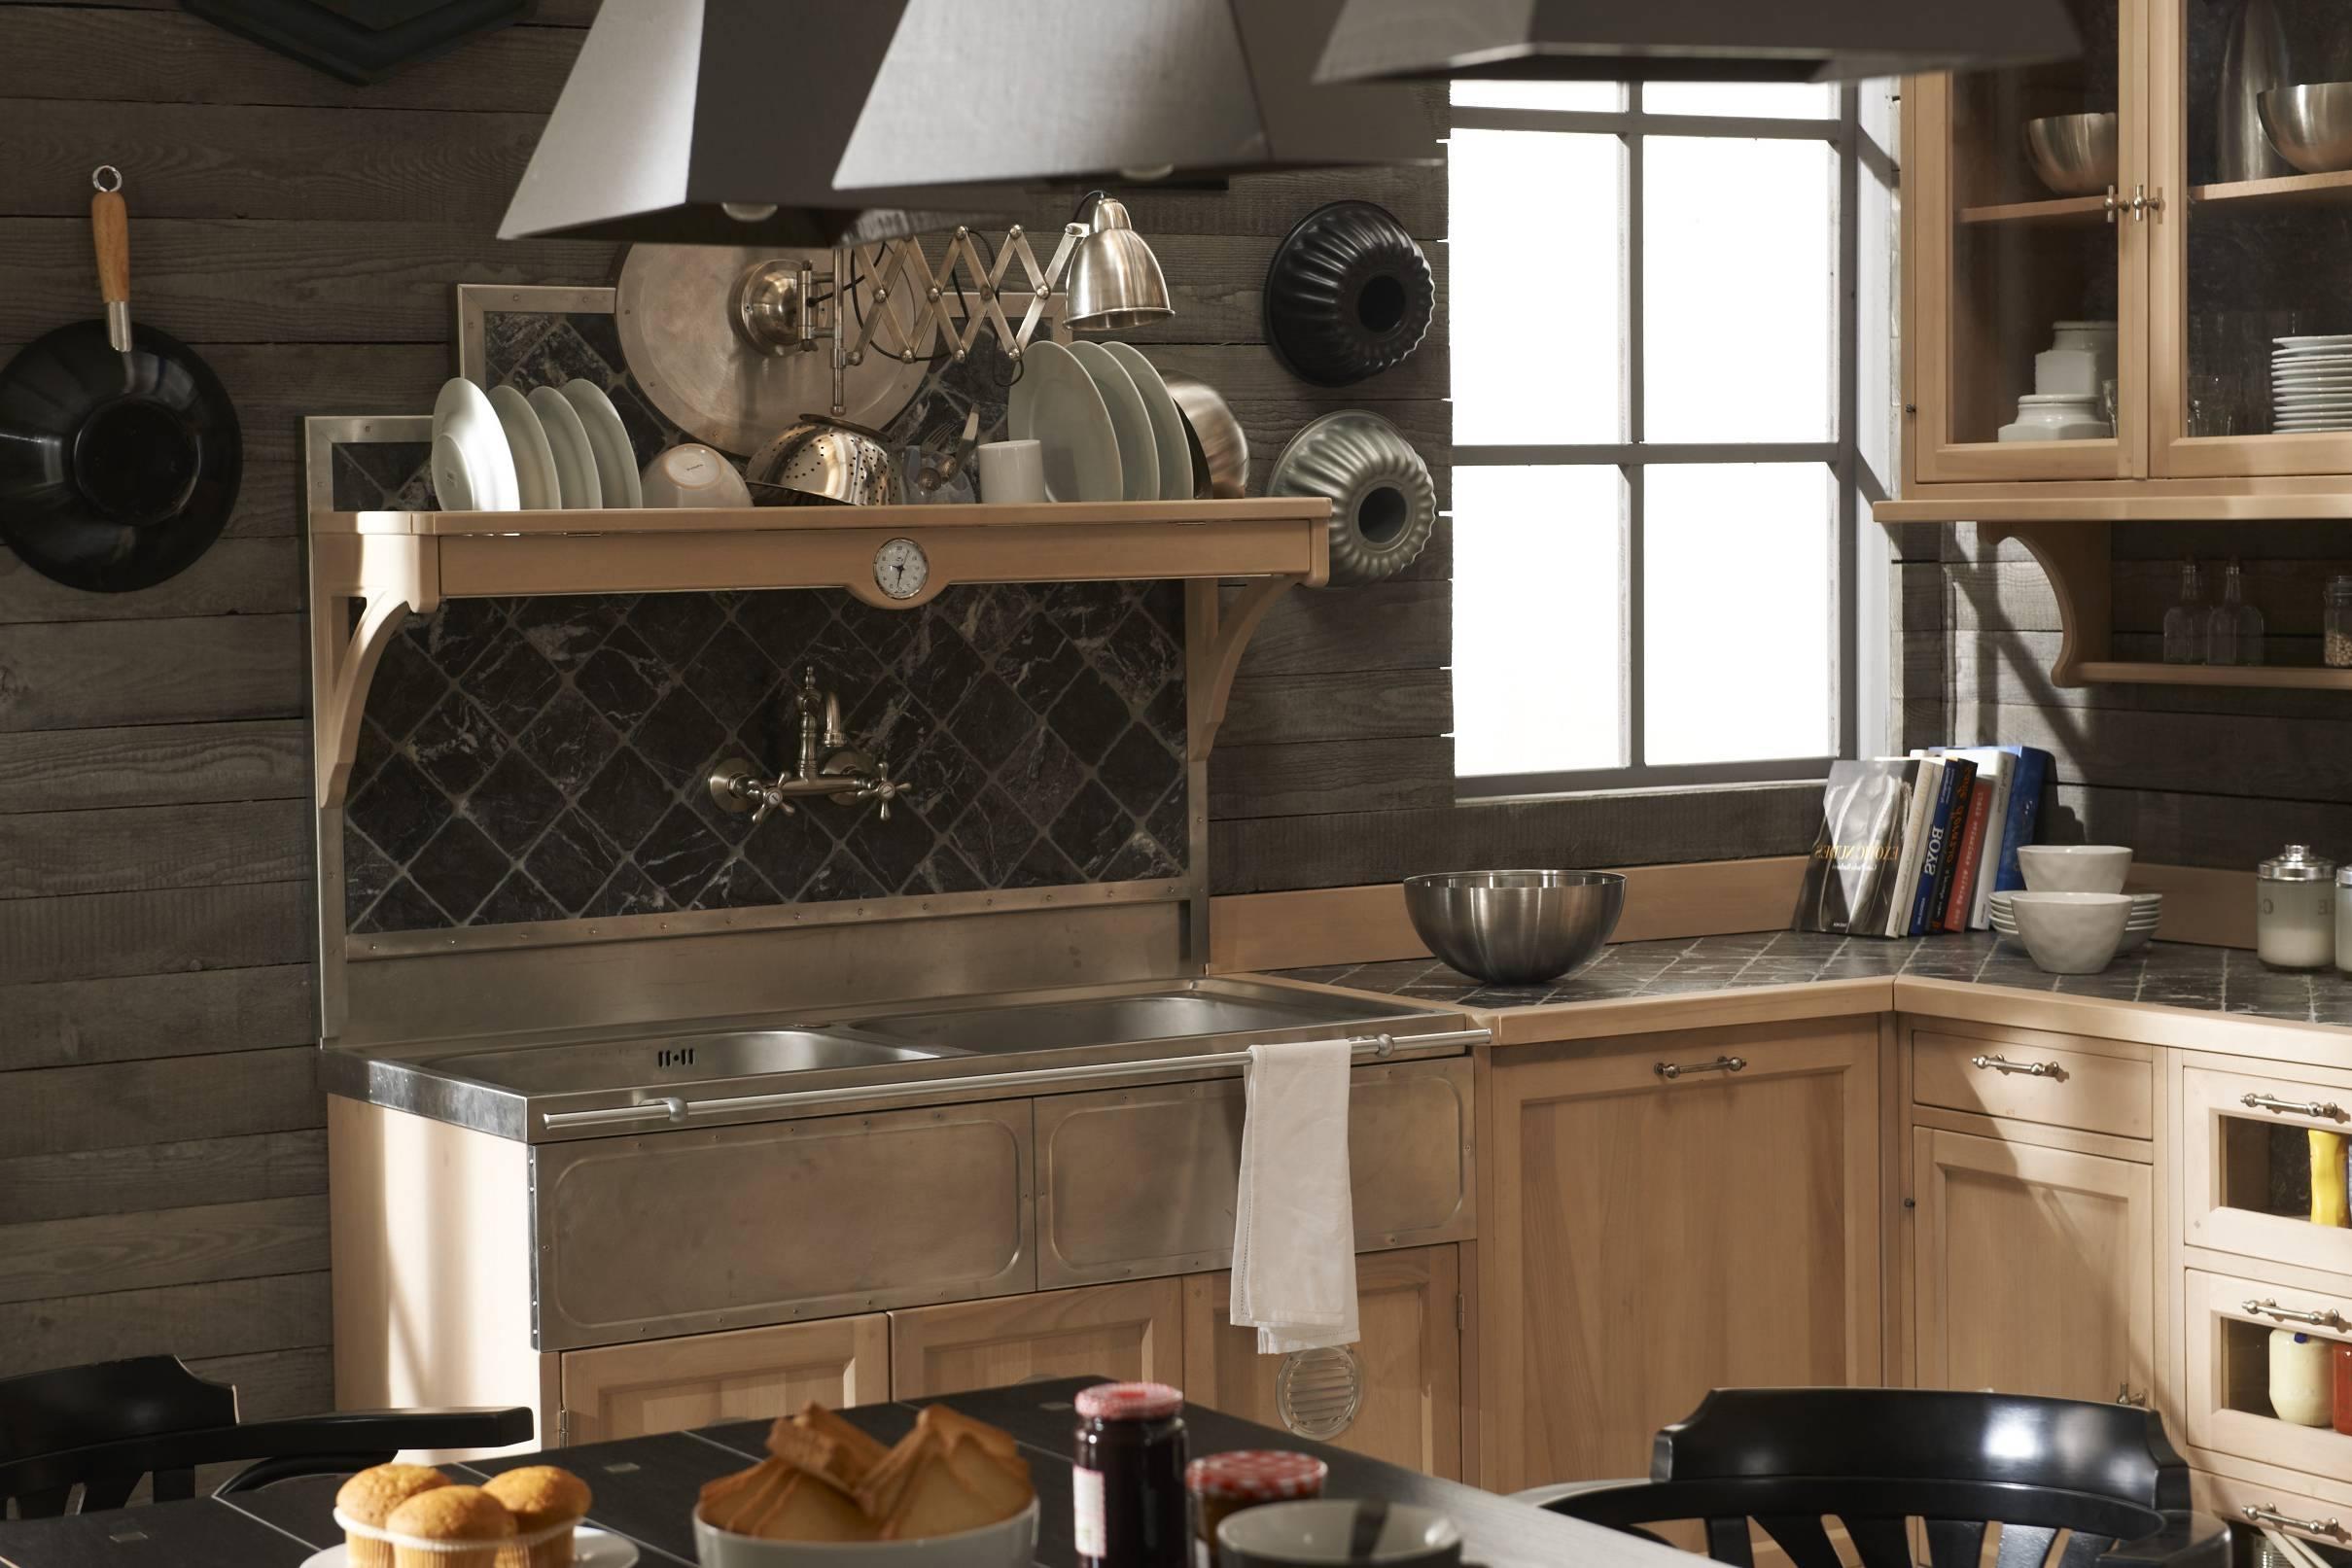 Beautiful Cucine Tutte Le Marche Photos - Ideas & Design 2017 ...